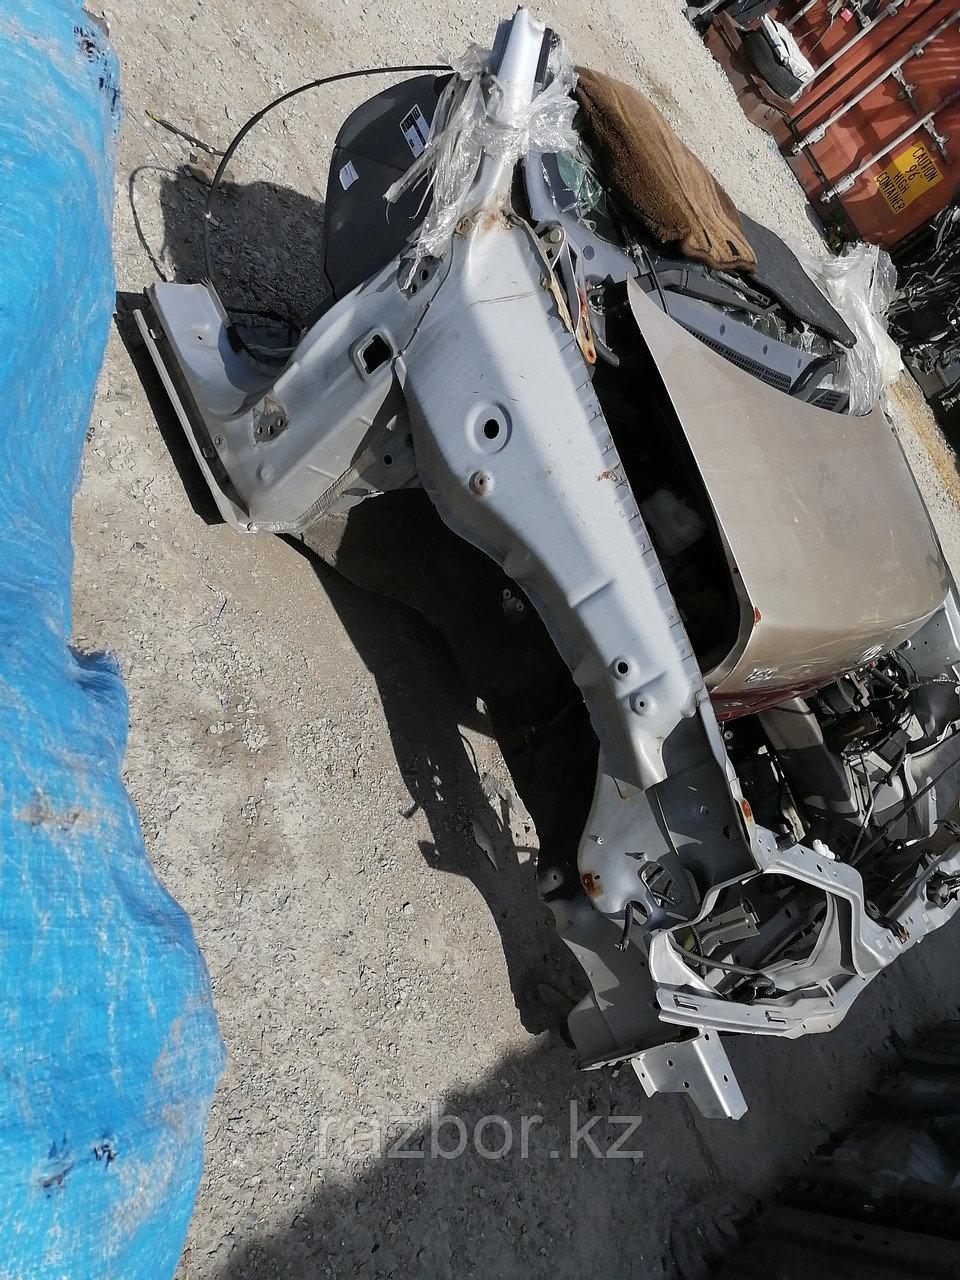 Лонжерон правый передний Honda CRV. (RD 1).